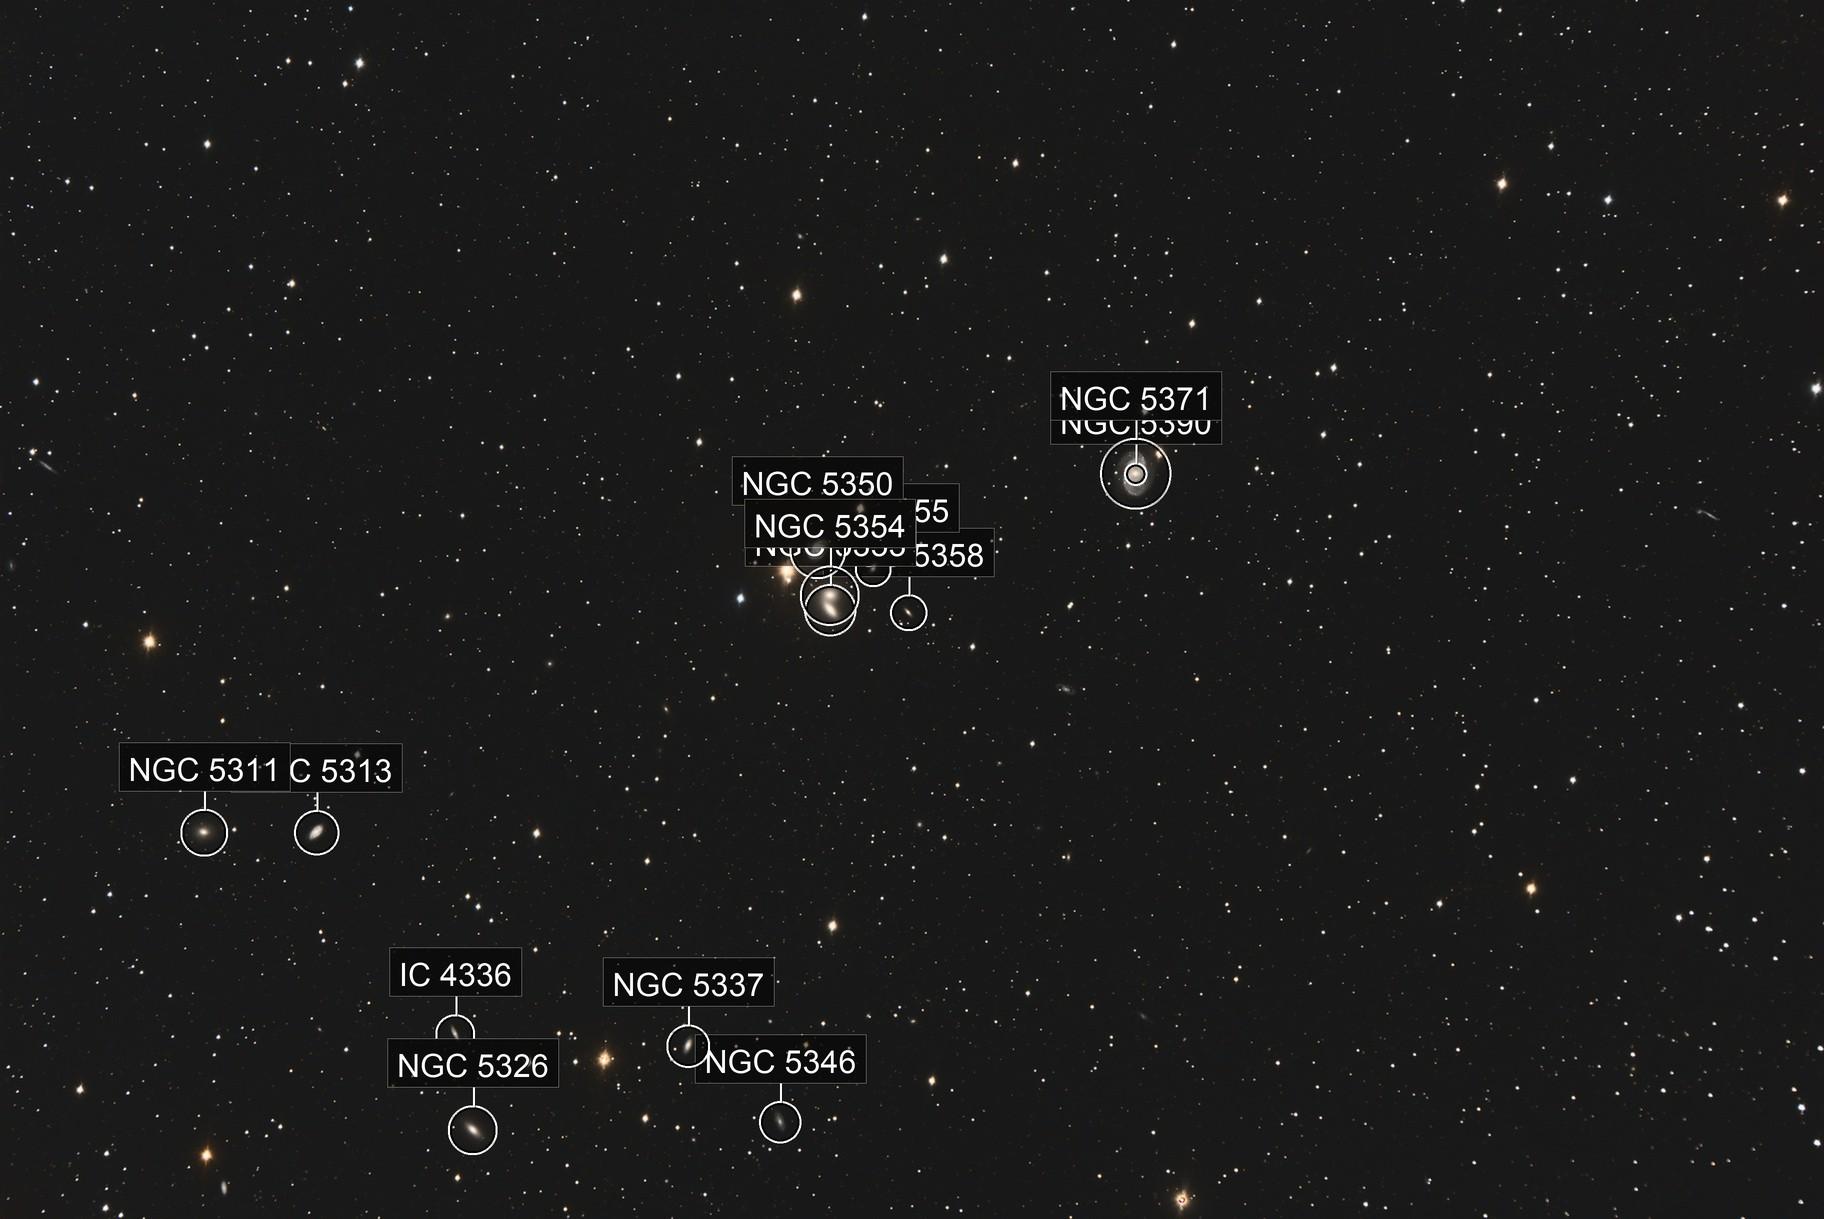 HCG68-Lots of Galaxies